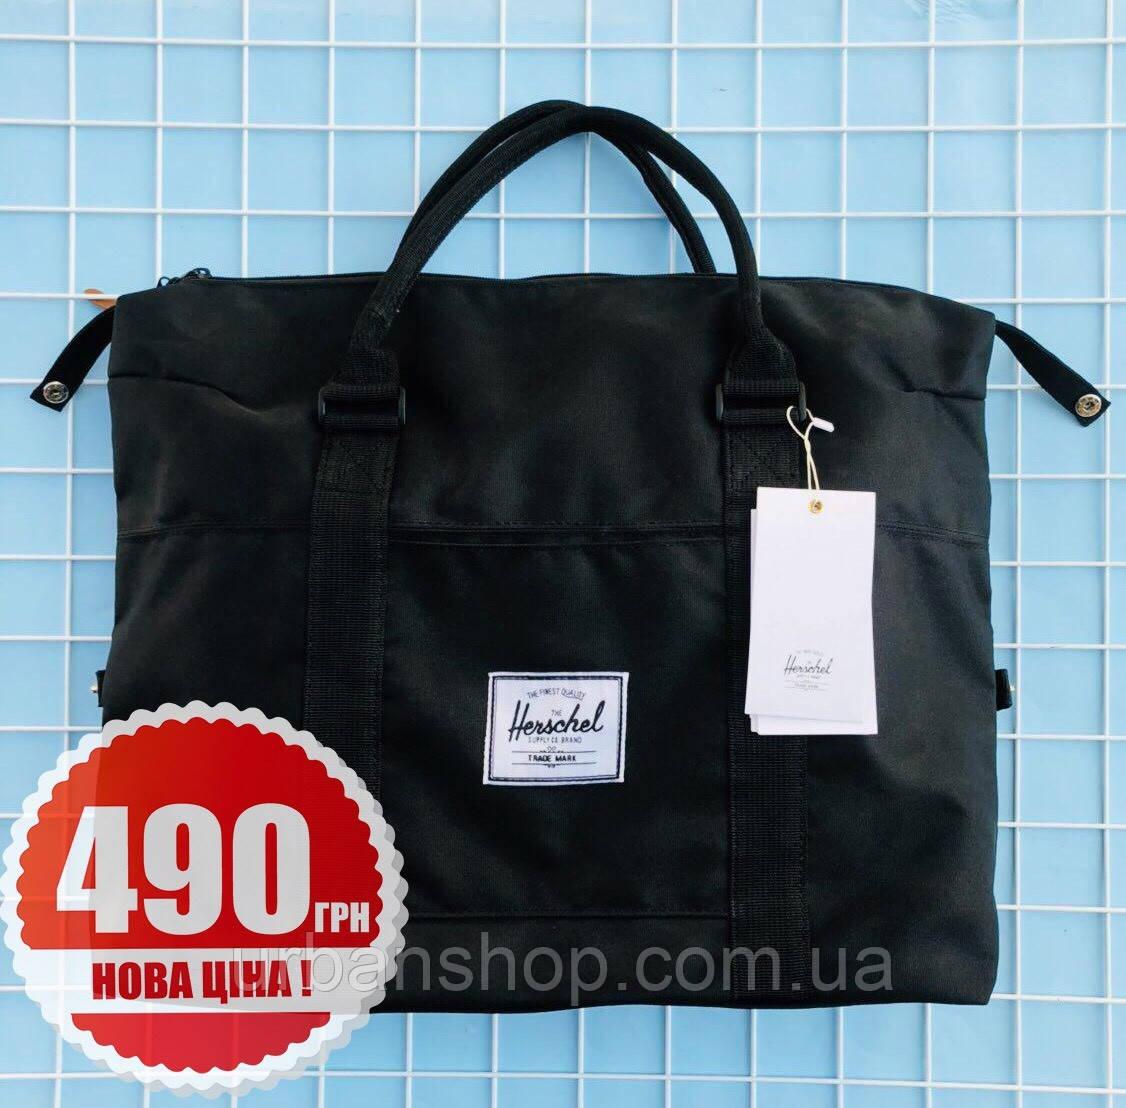 Рюкзак Hershell Strand Duffle Black